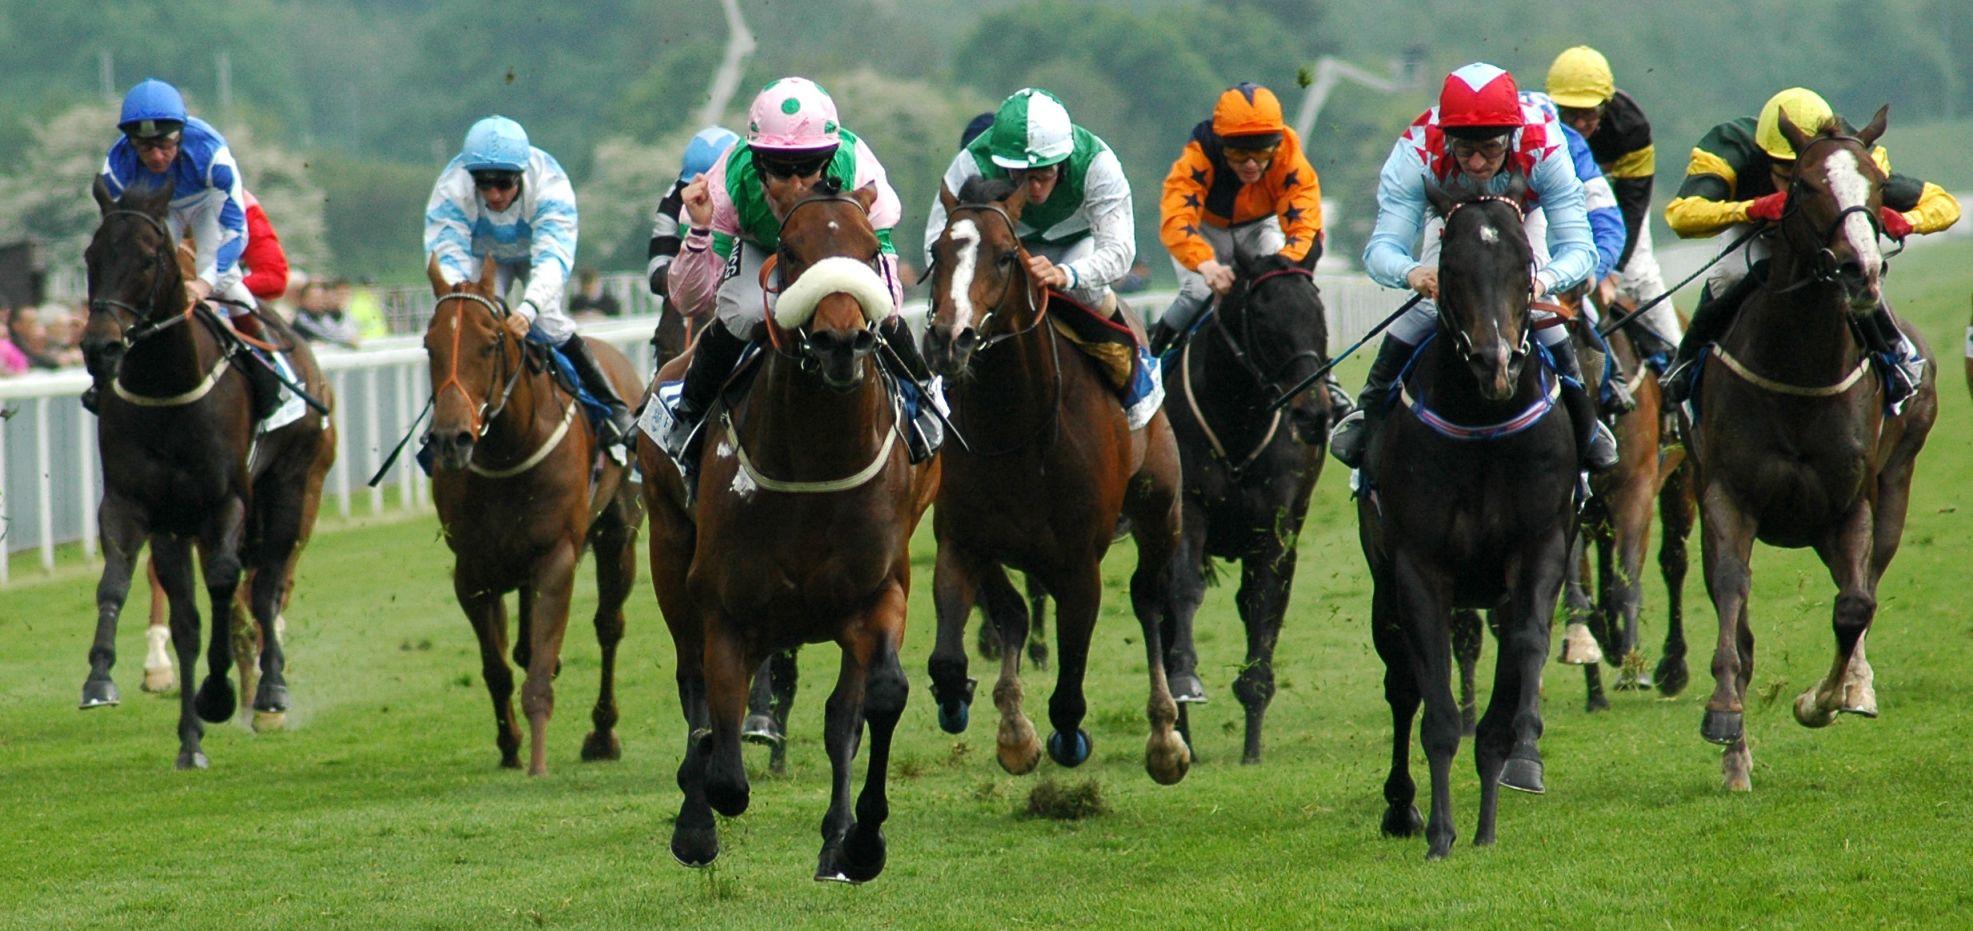 Corrida de Cavalos - Turfe